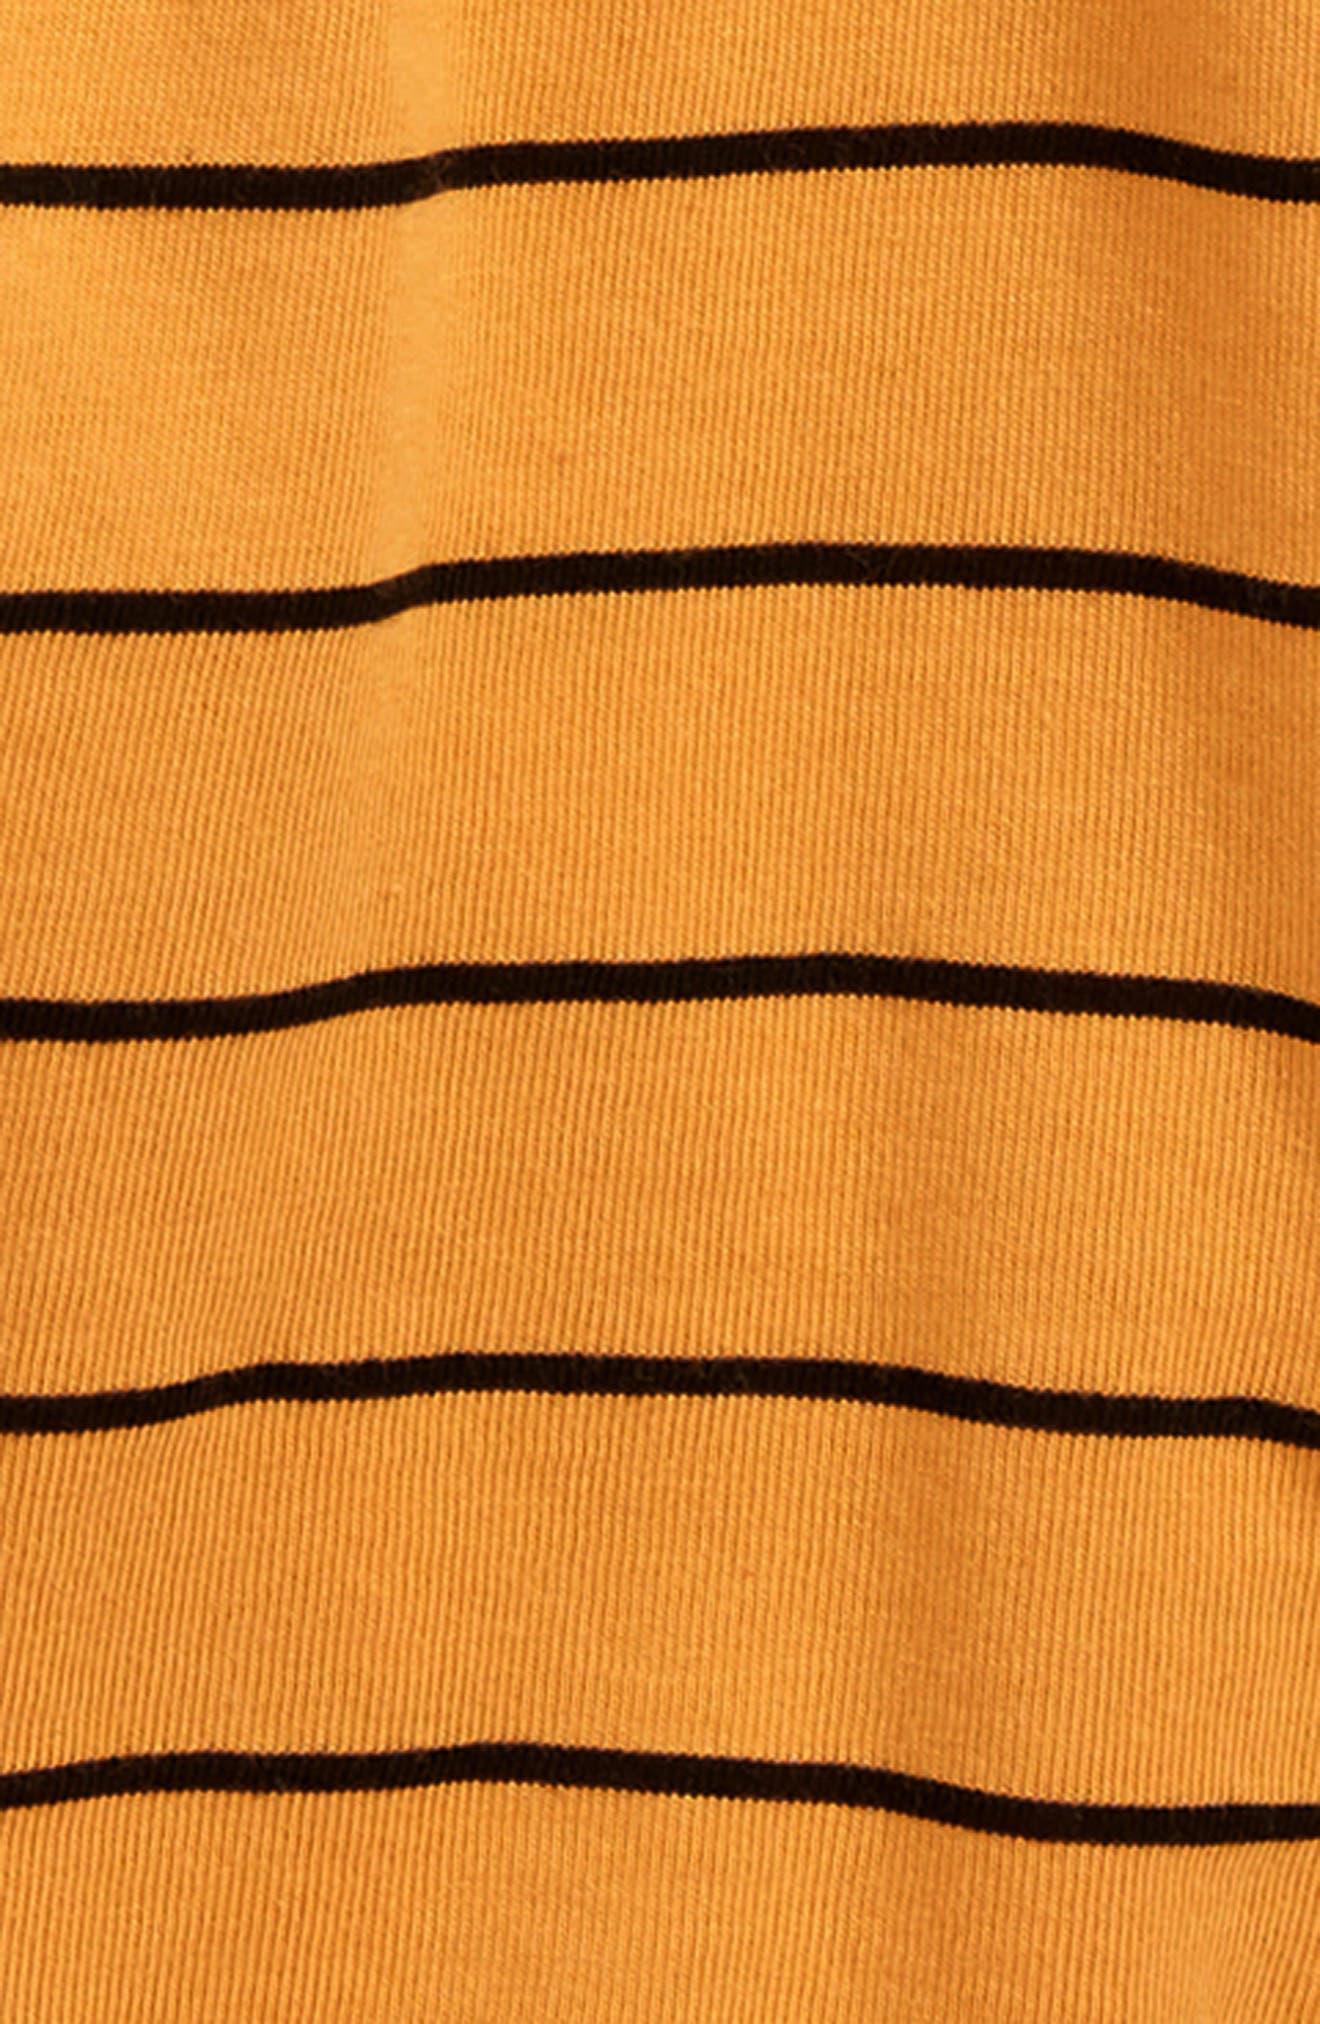 Graphic T-Shirt & Pants Set,                             Alternate thumbnail 2, color,                             WHITE/ MARIGOLD